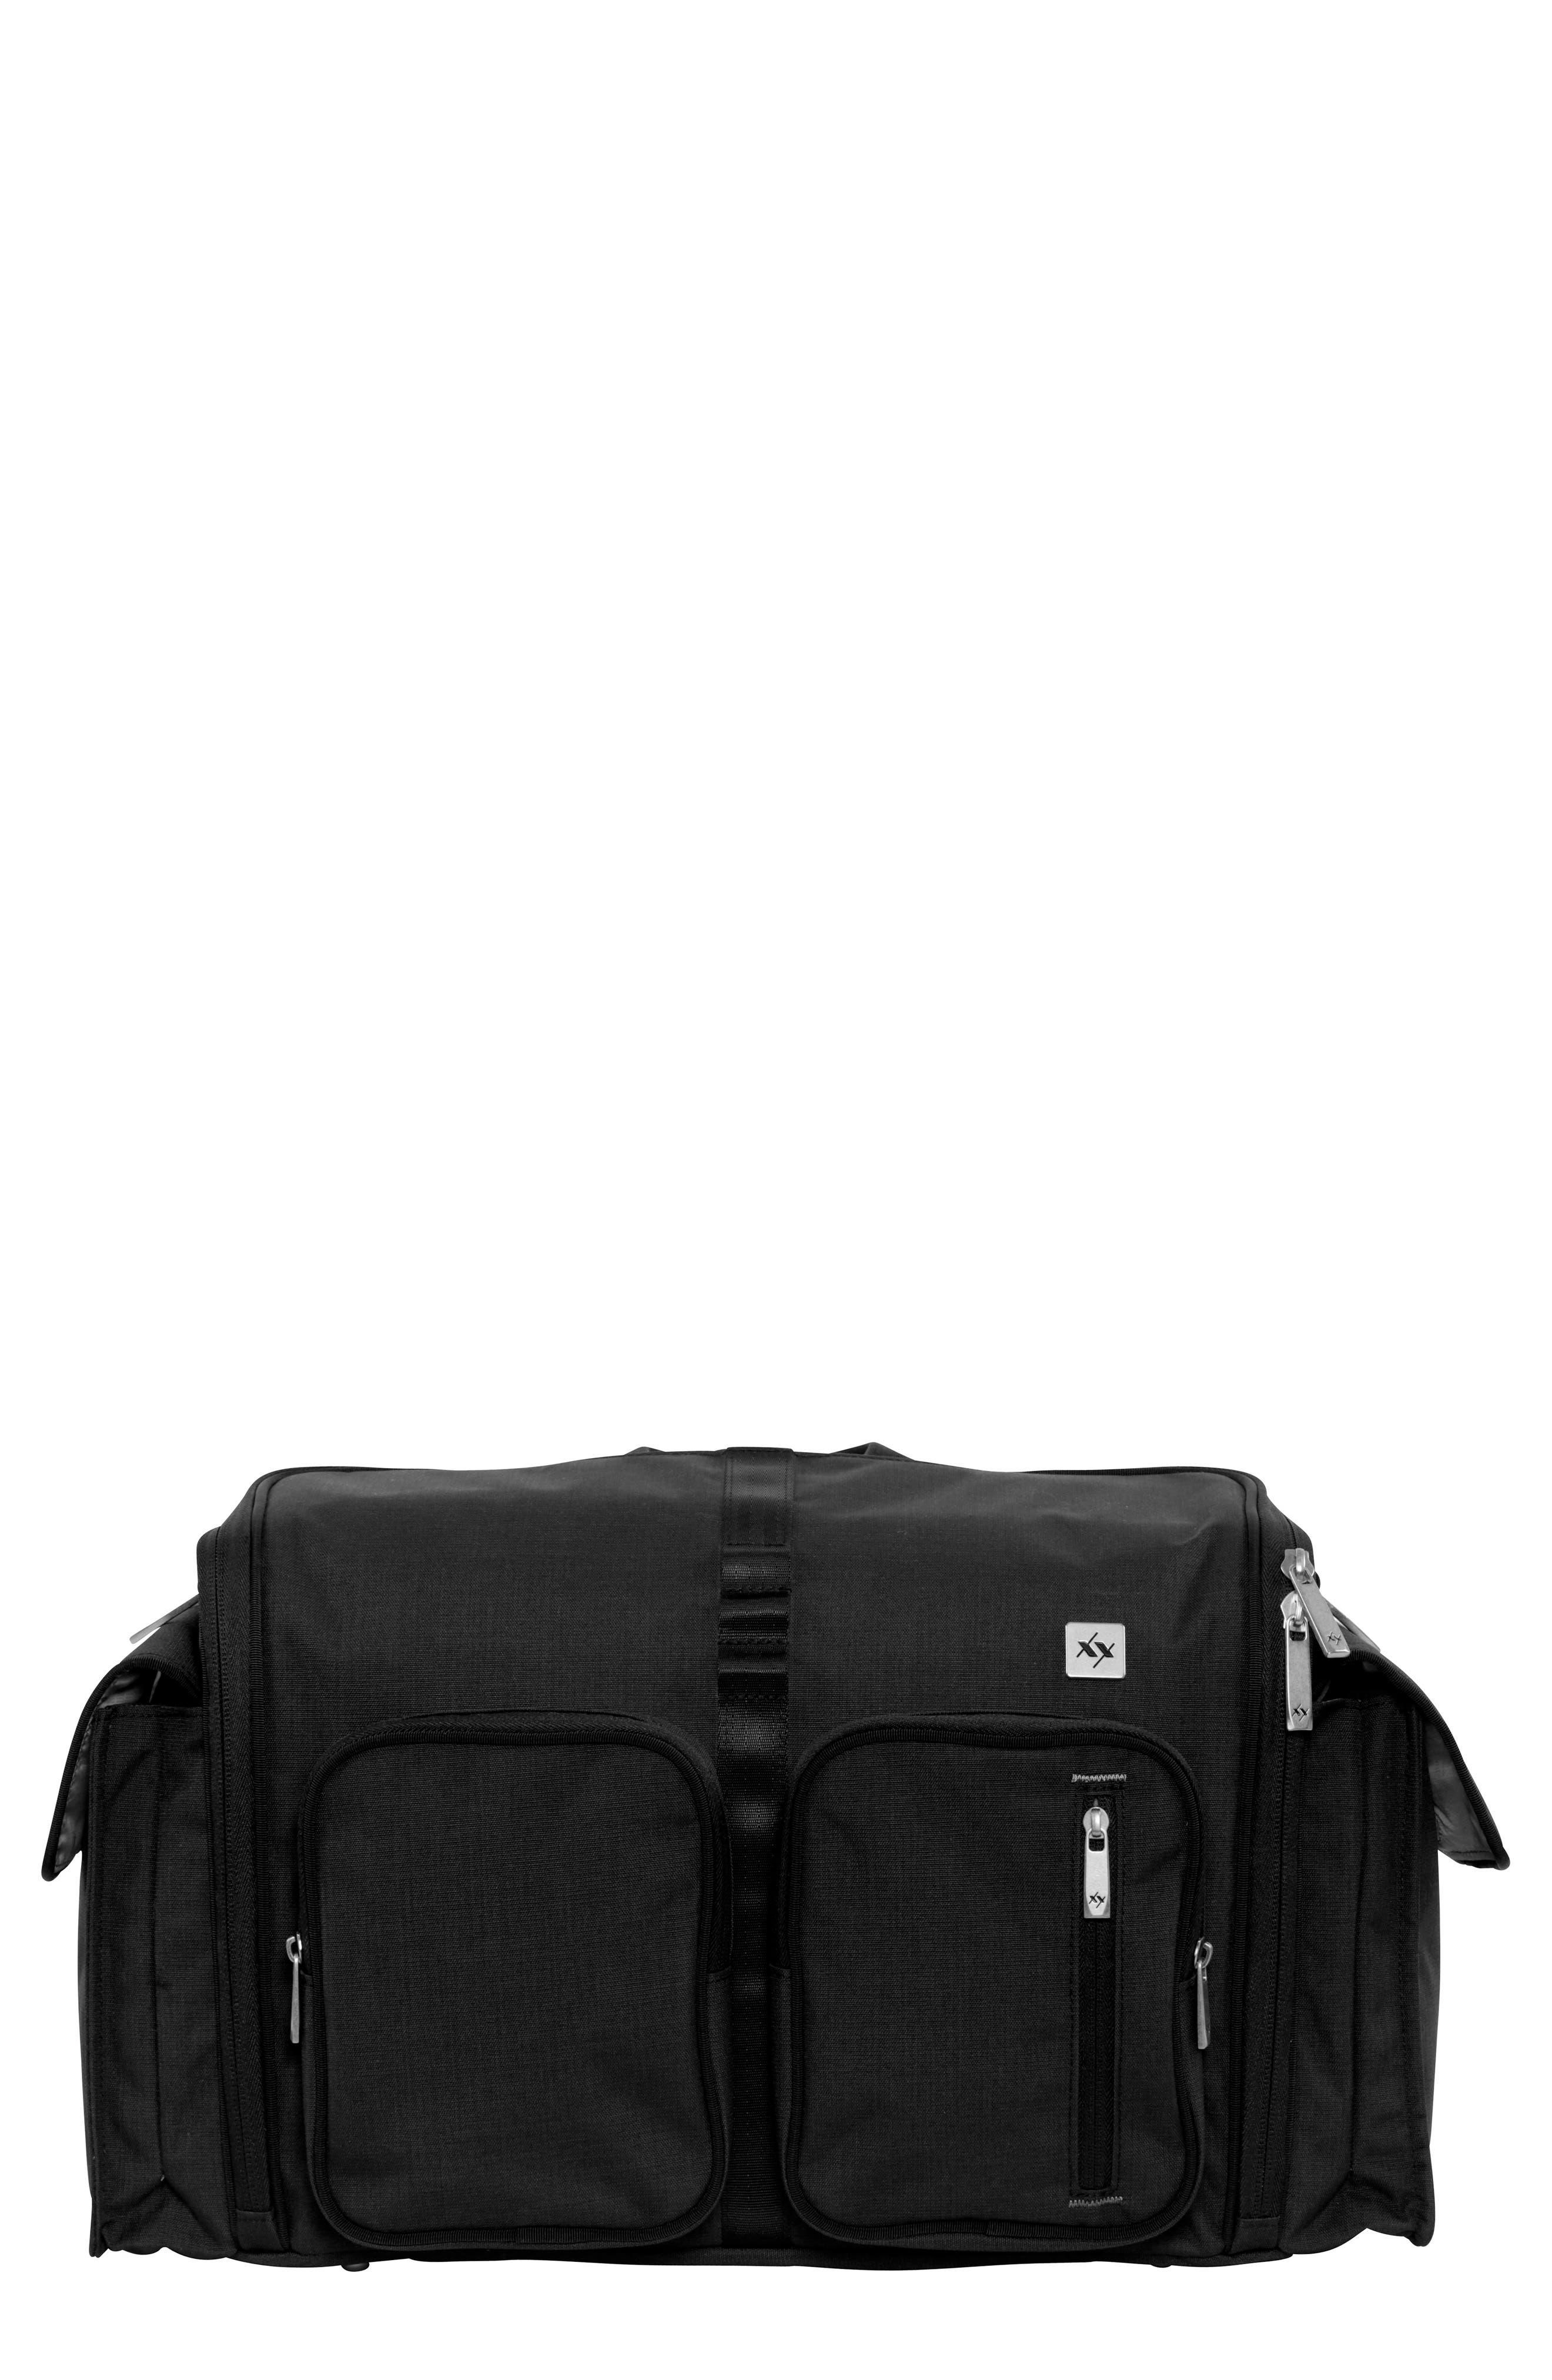 XY Clone Diaper Bag,                             Main thumbnail 1, color,                             CARBON